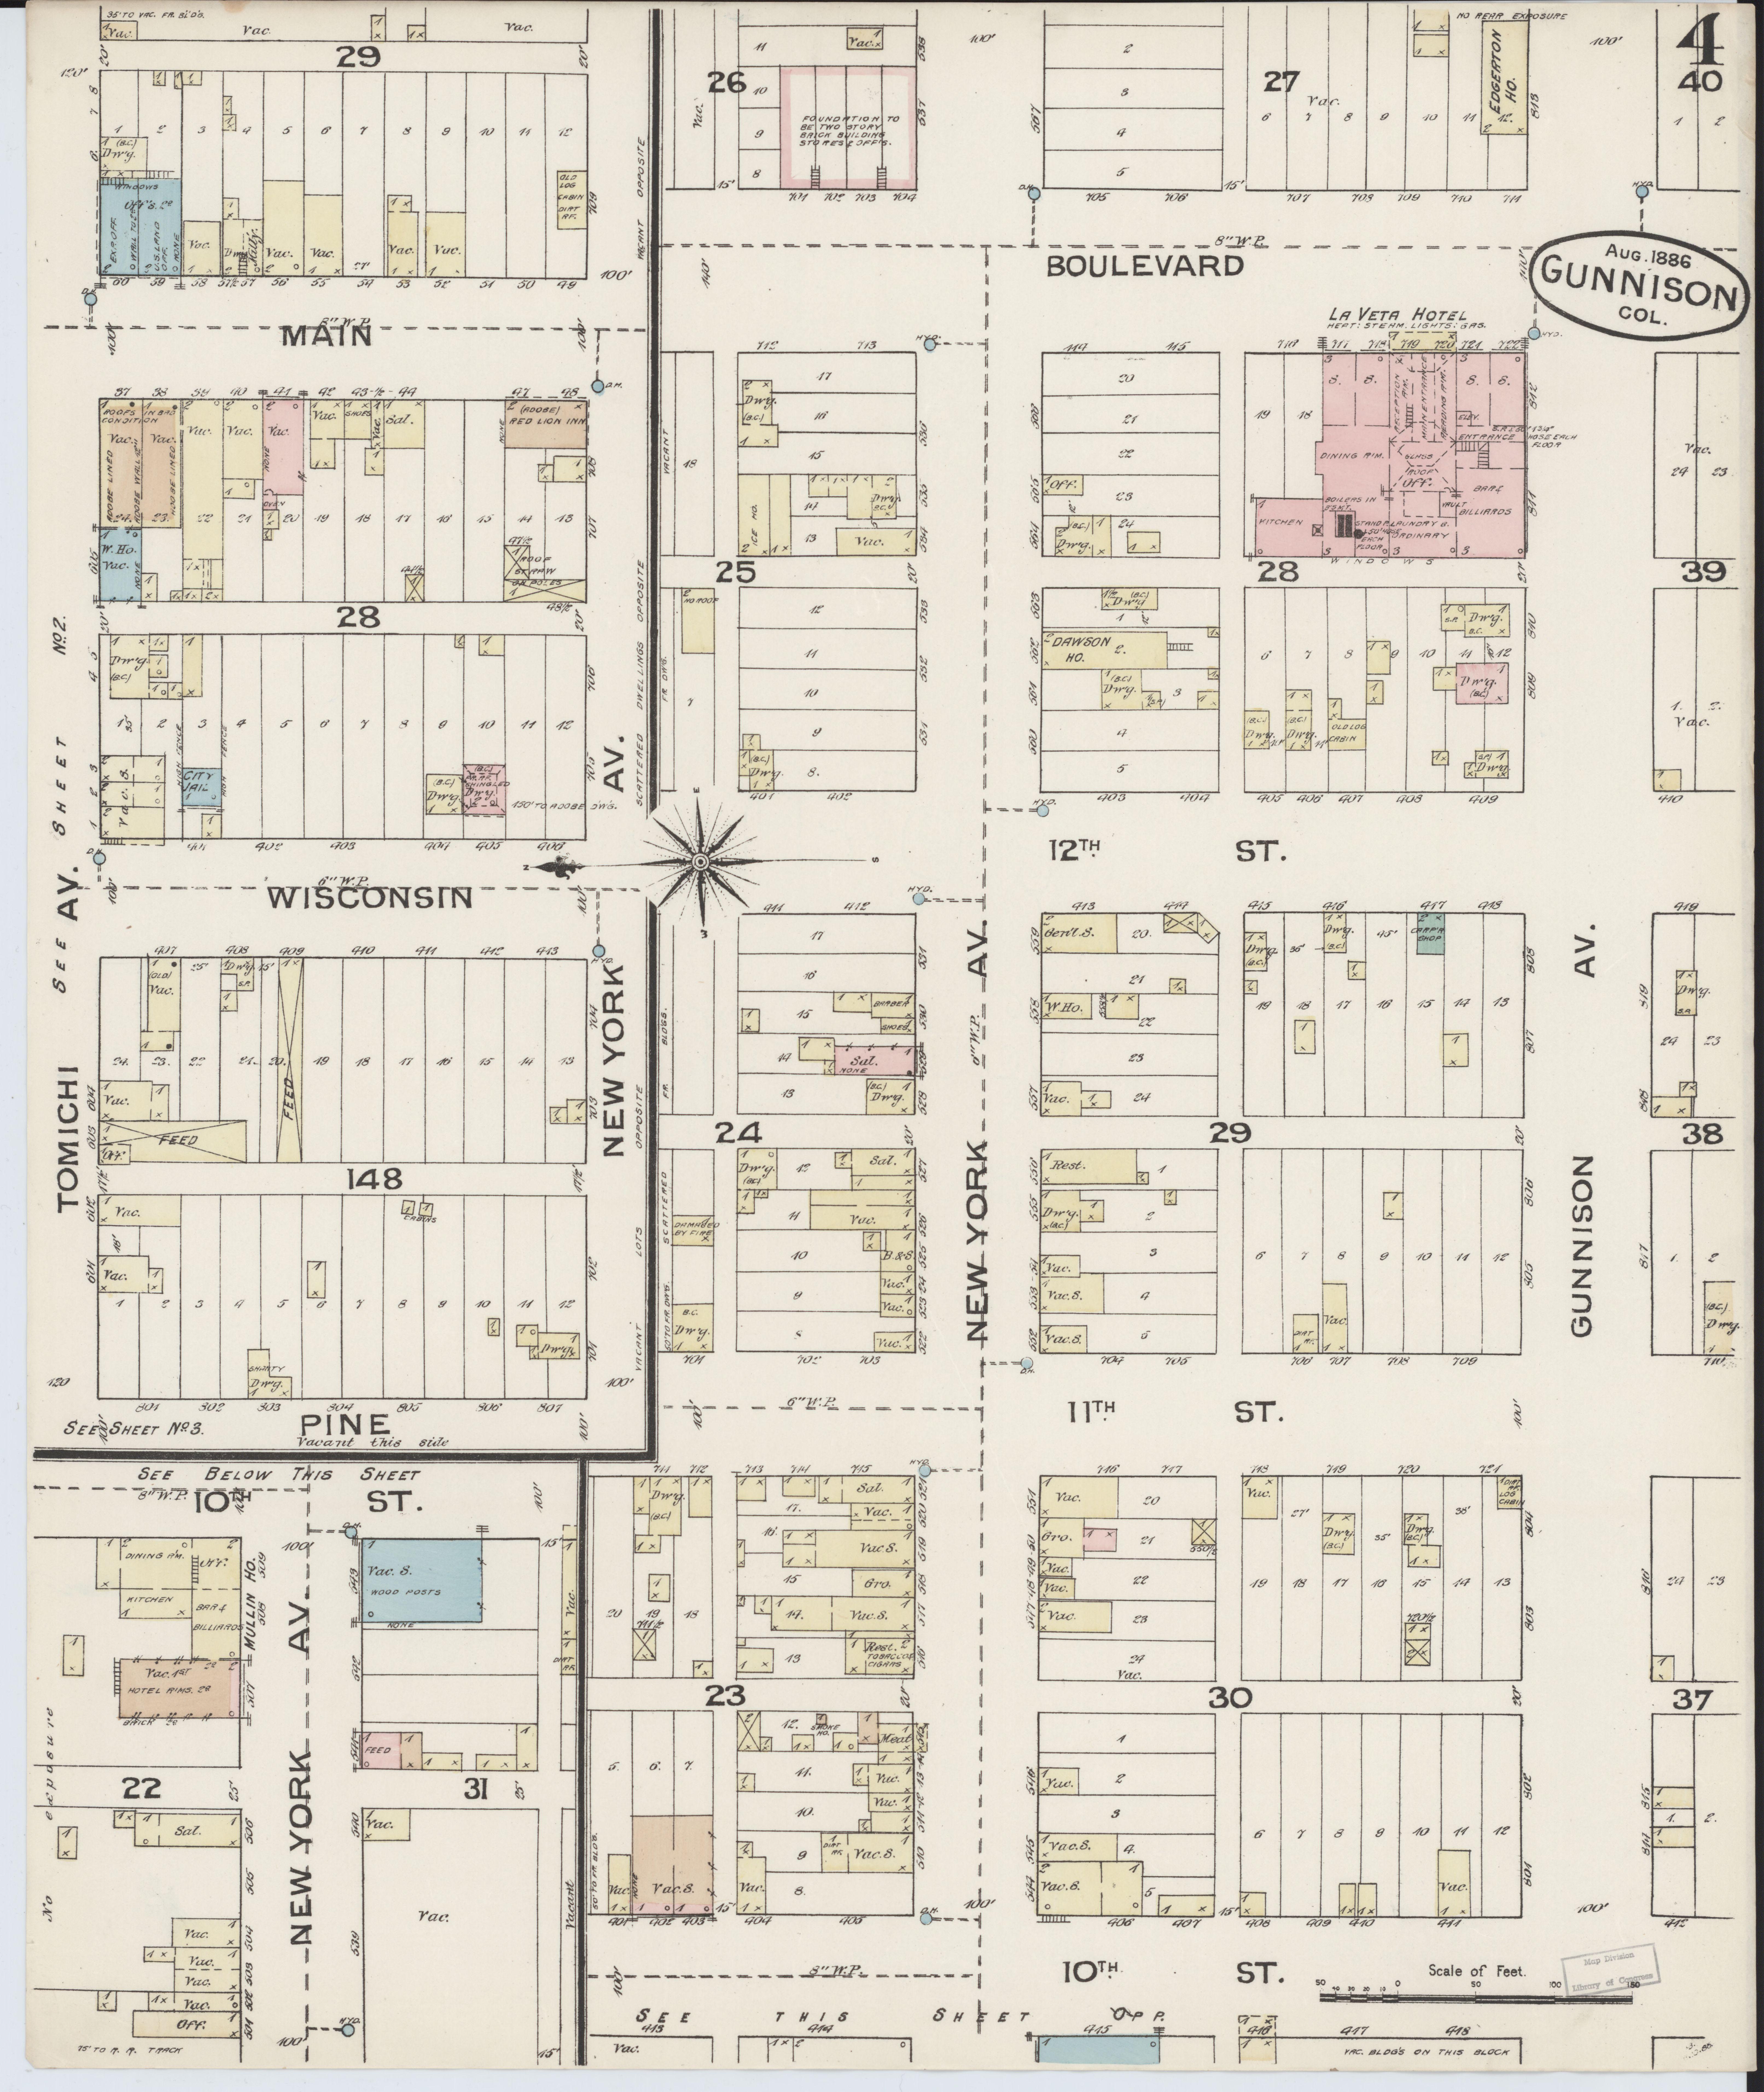 Gunnison County Colorado Map.File Sanborn Fire Insurance Map From Gunnison Gunnison County